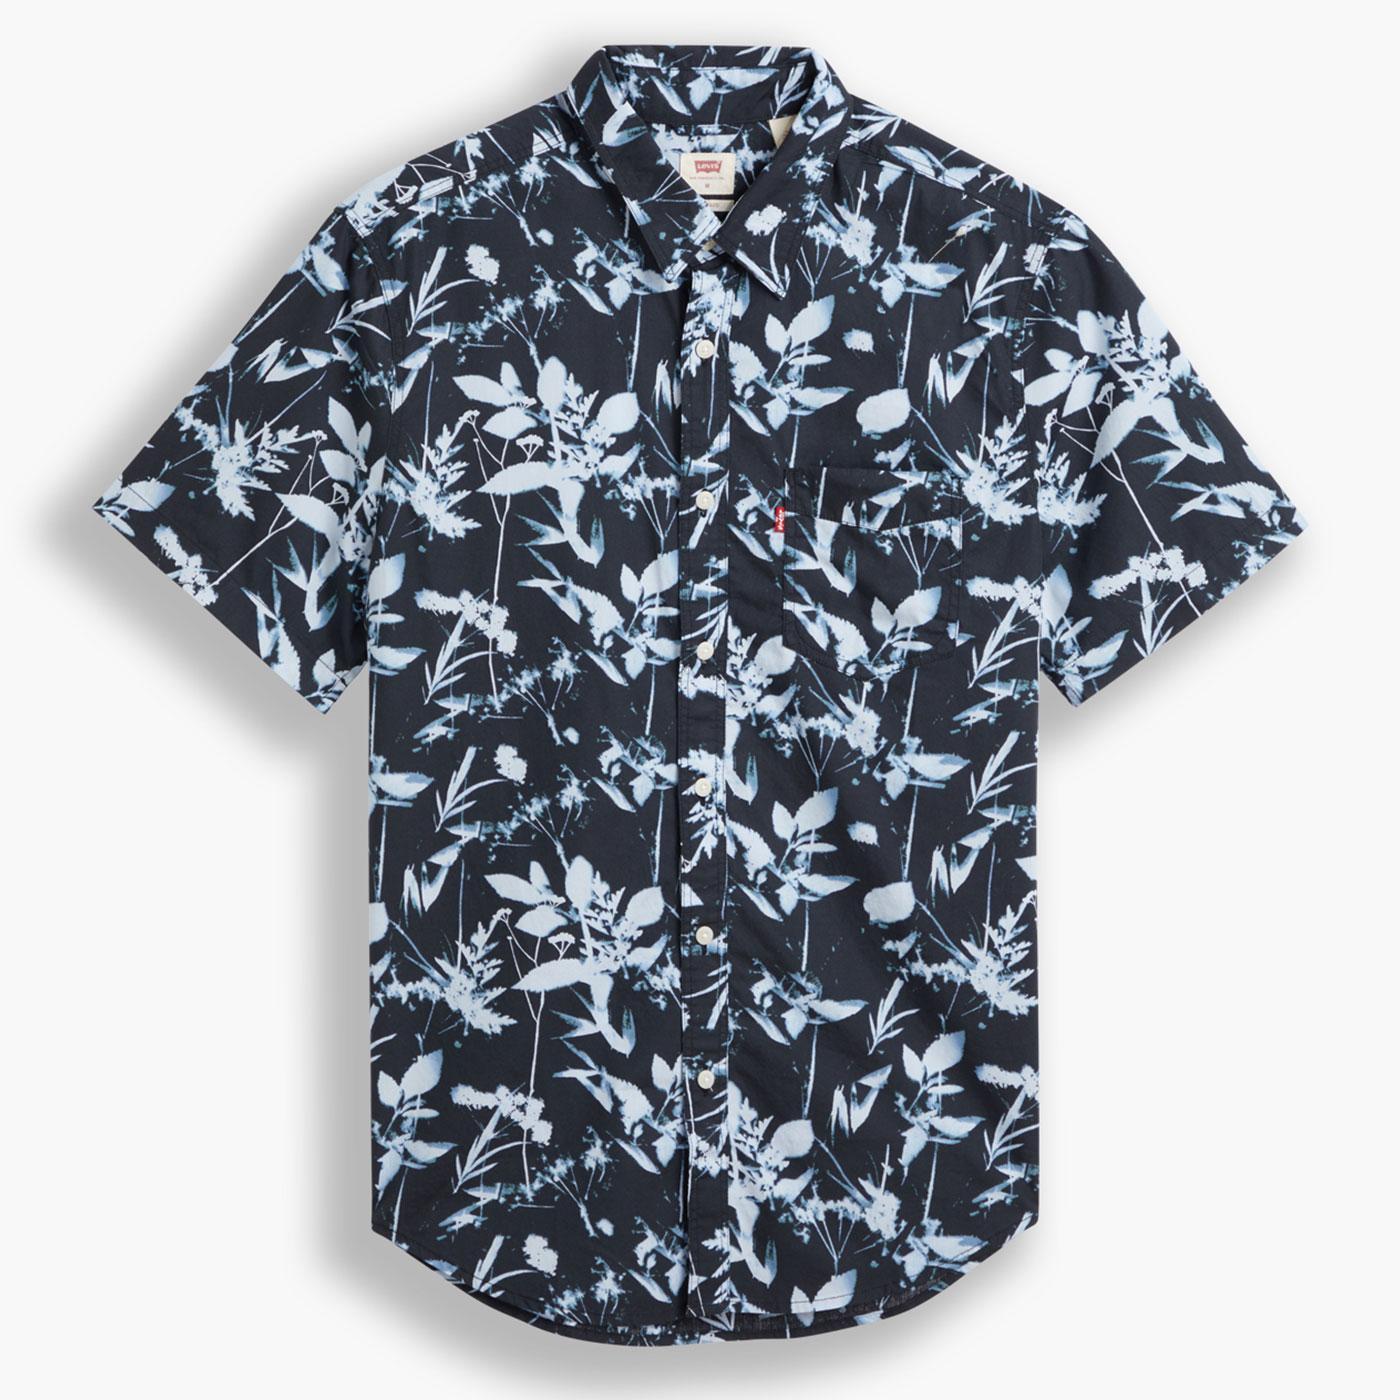 LEVI'S Sunset 1 Pocket Retro 70s Leaf Print Shirt